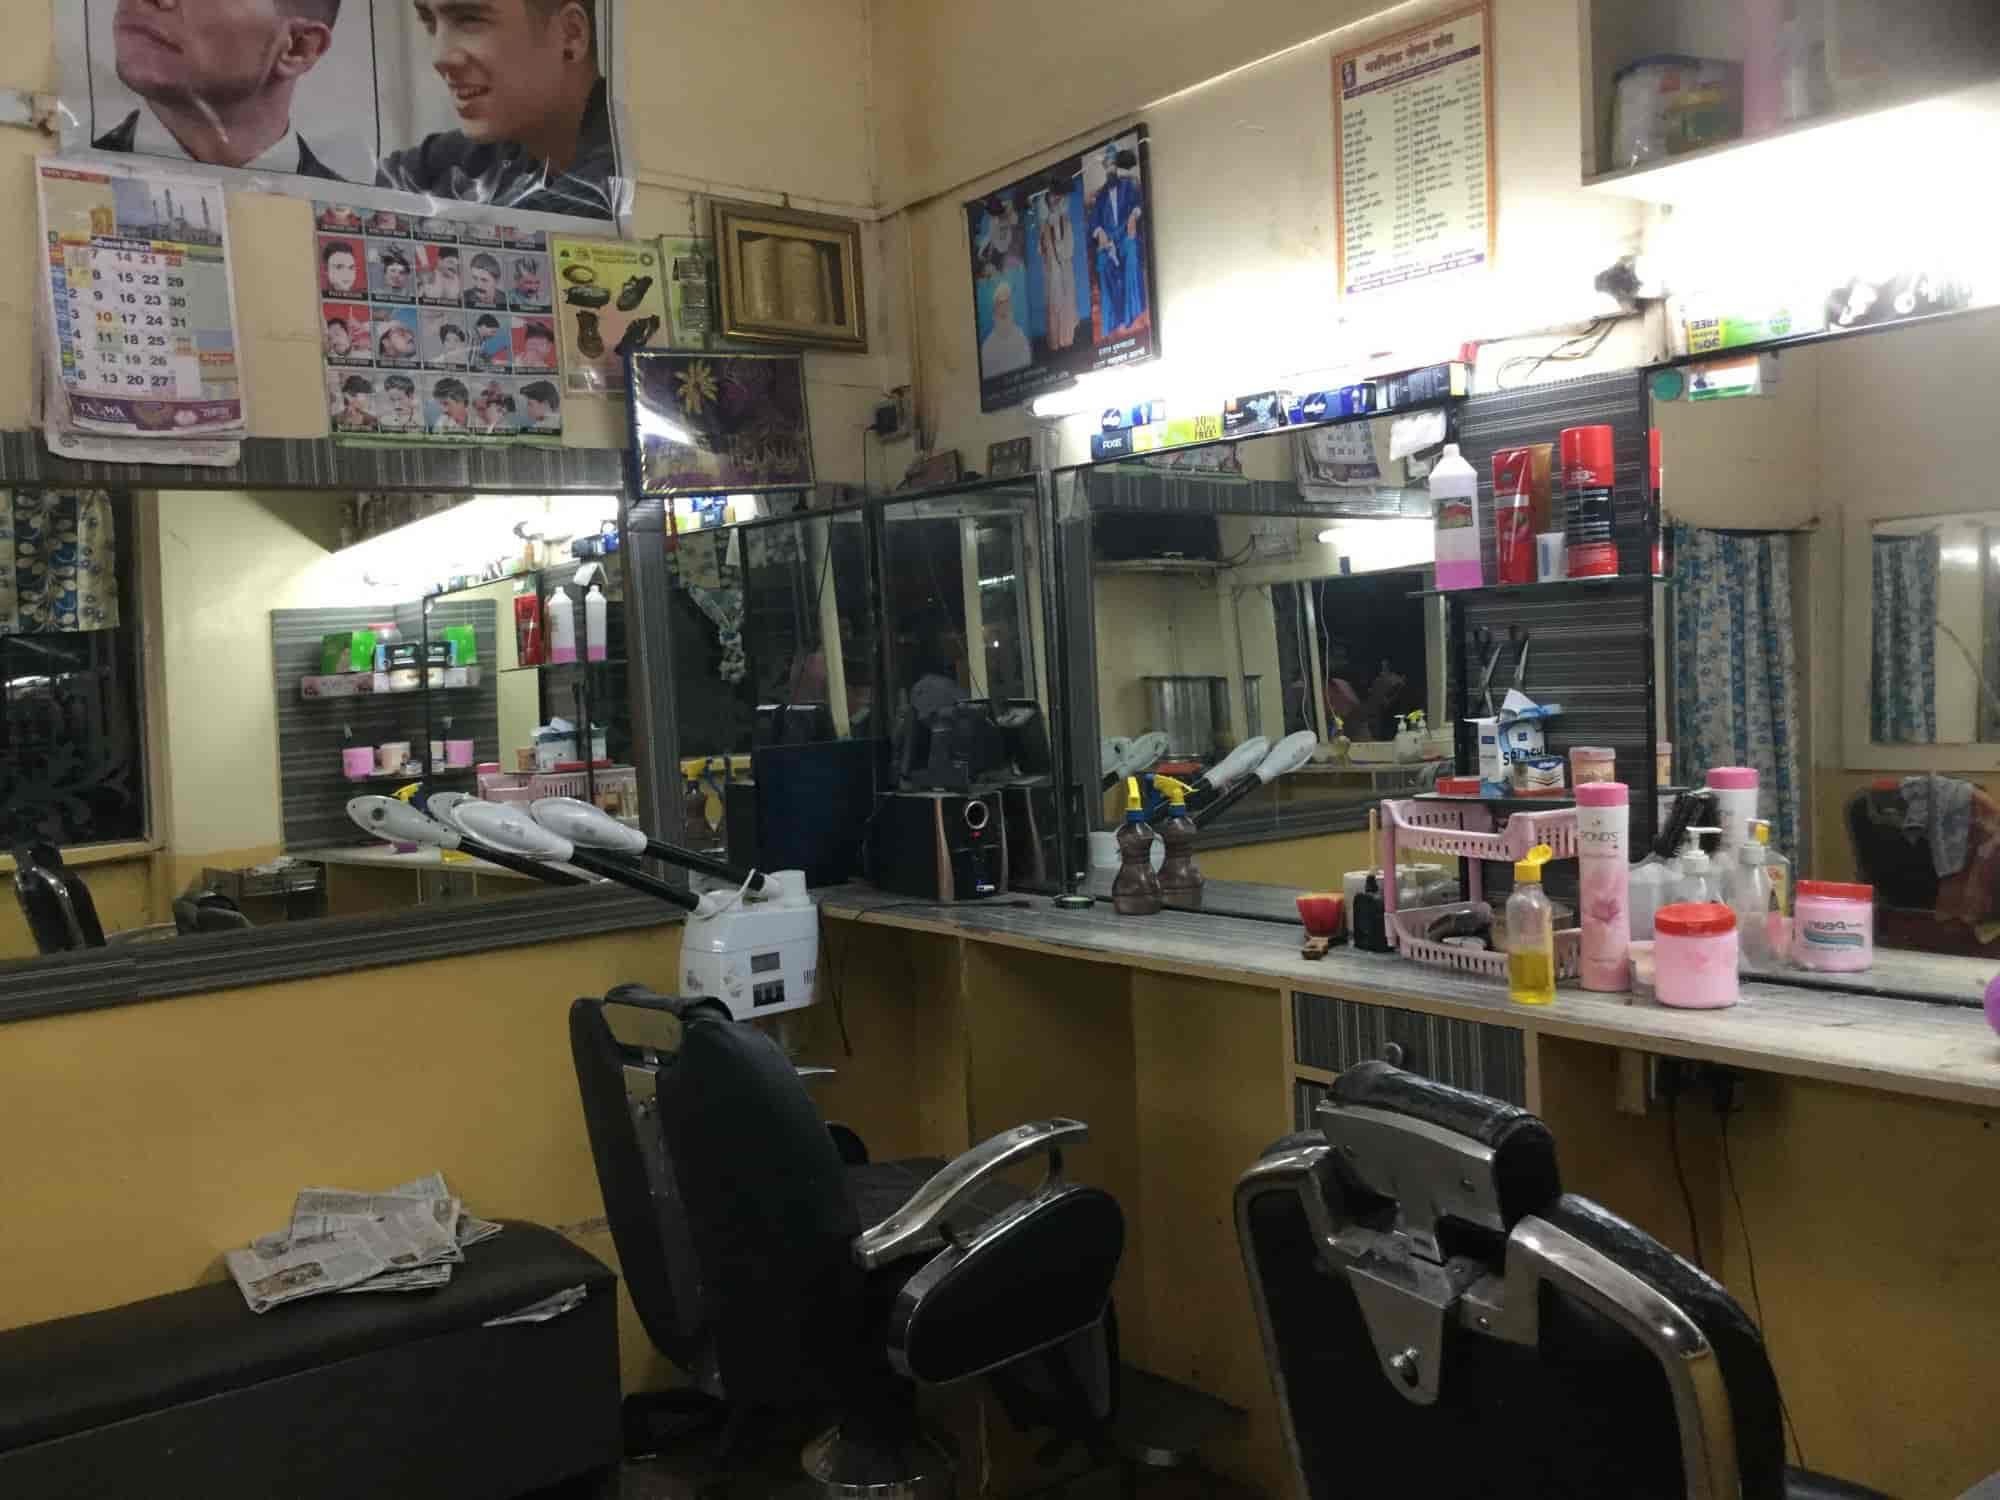 shabina hair cut salon photos, aundh, pune- pictures & images